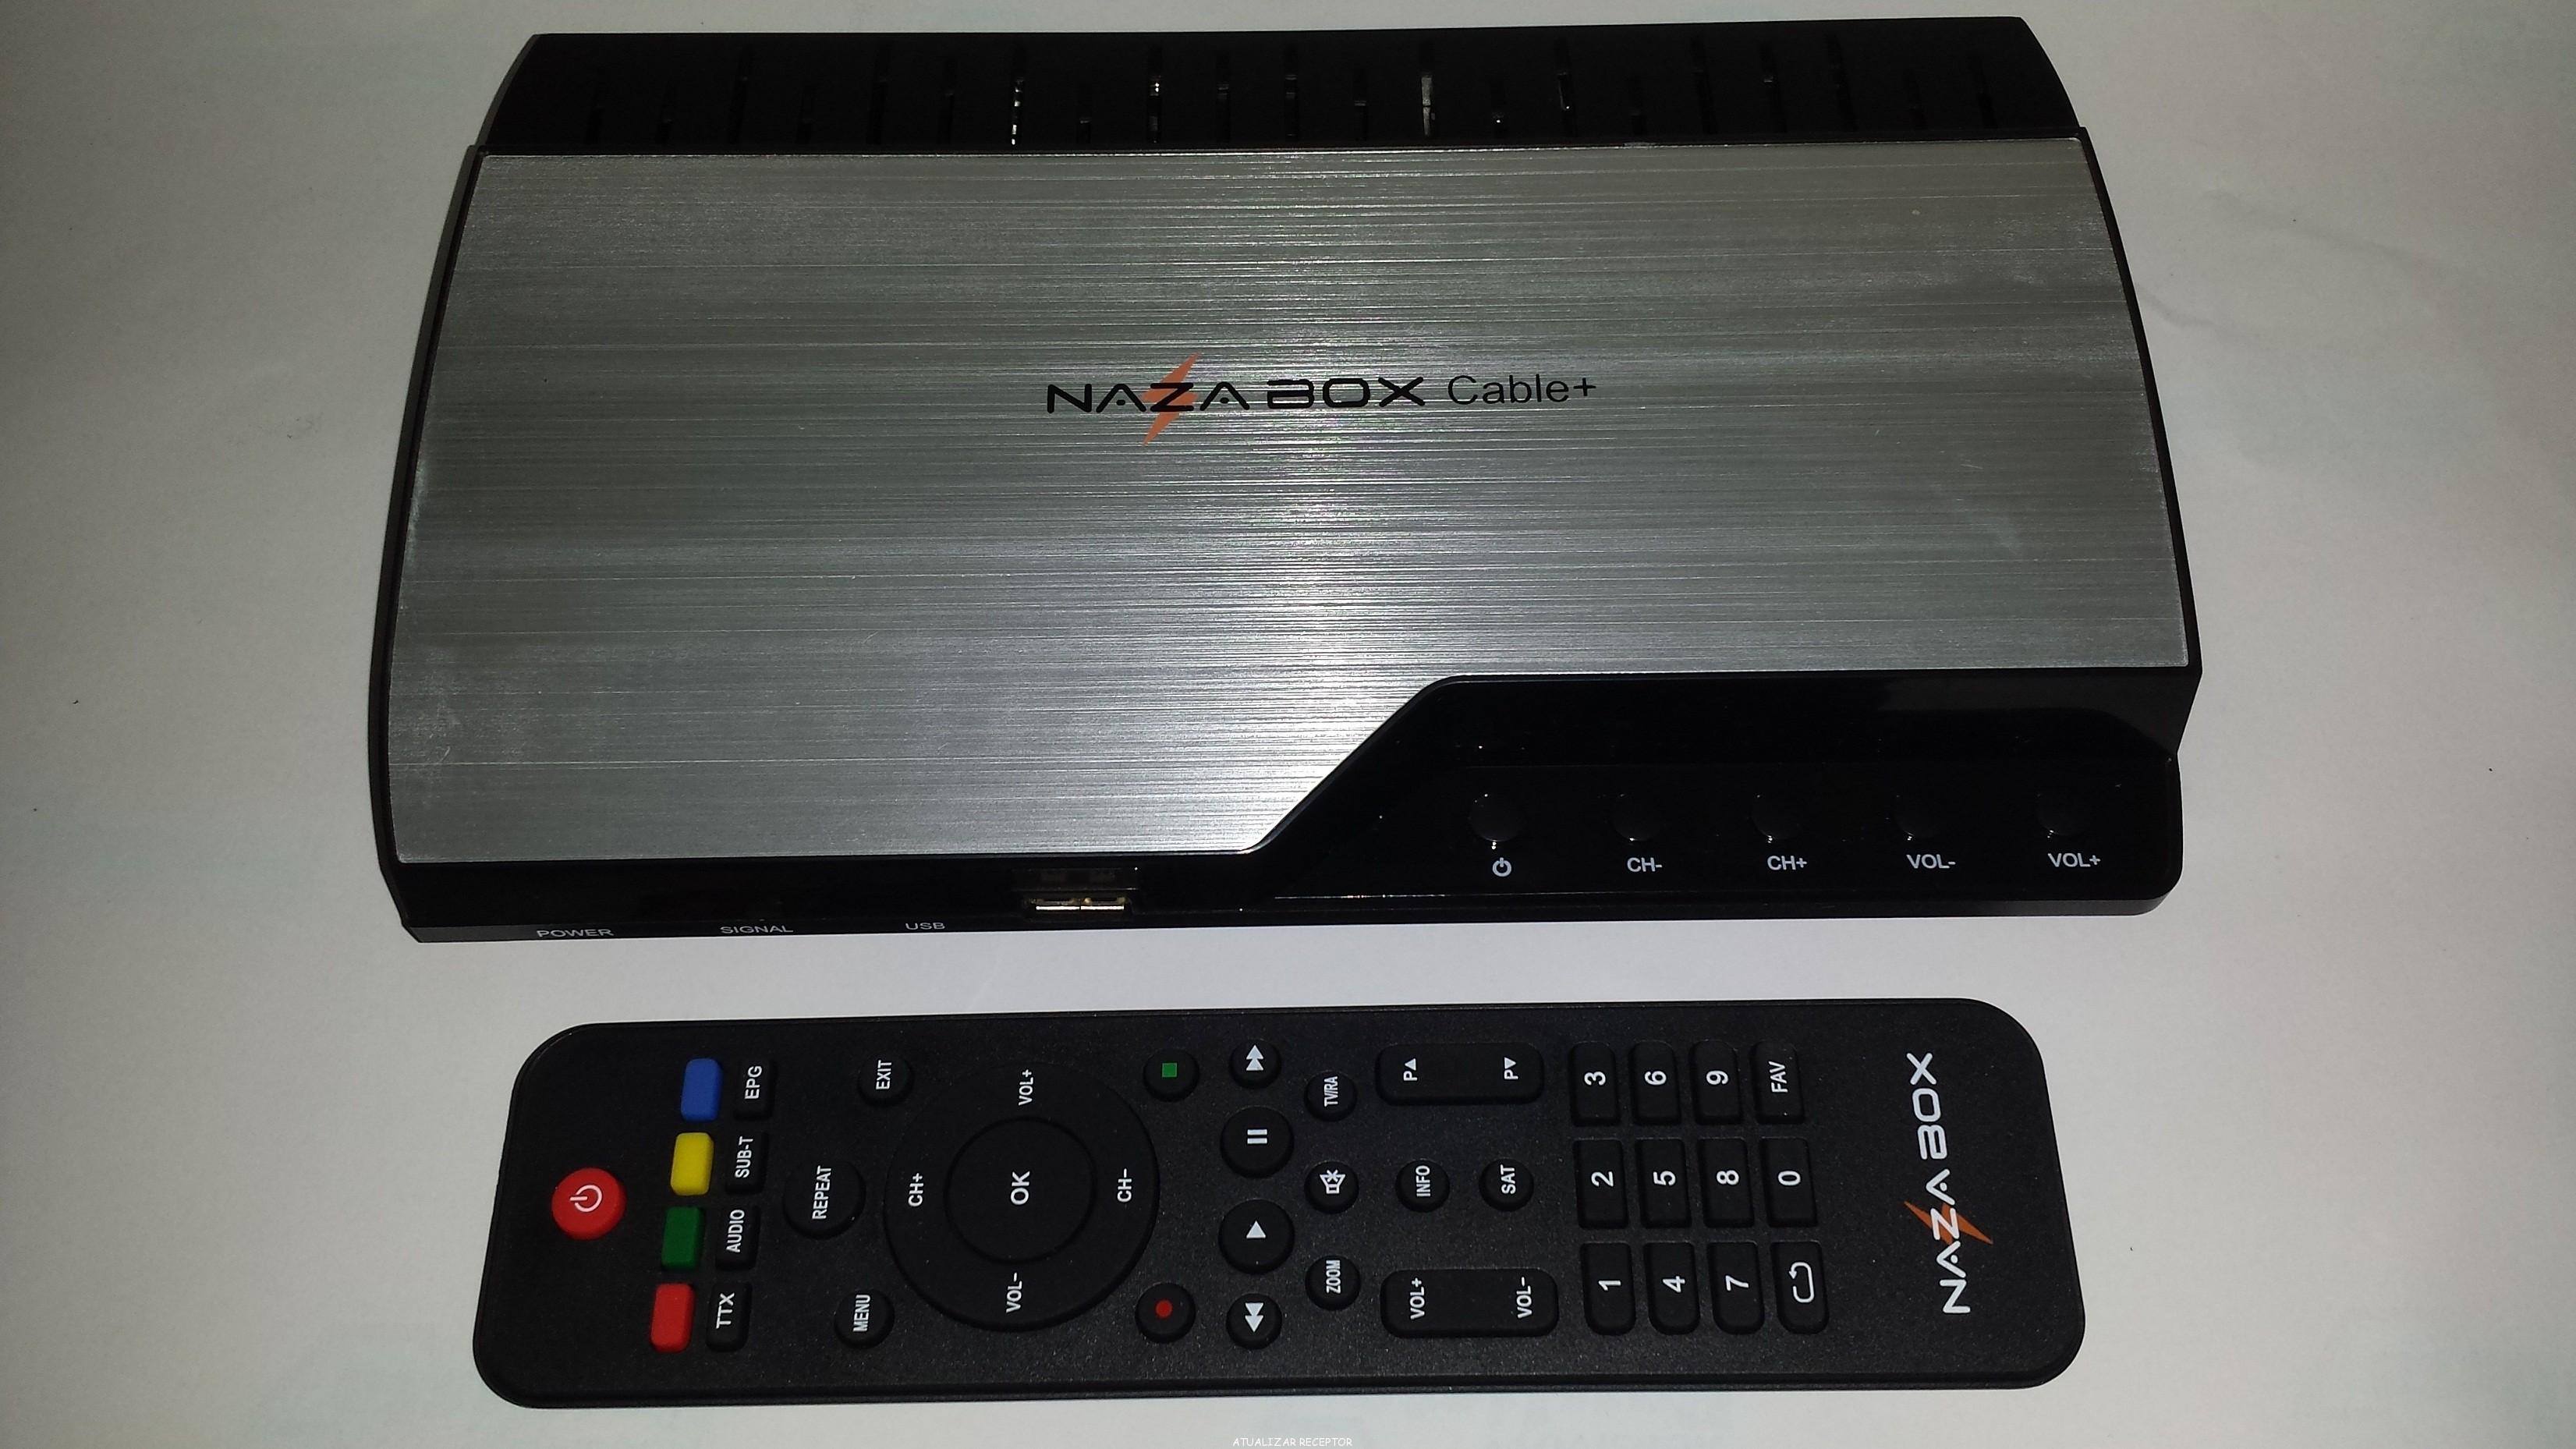 NazaBox Cable HD Mini